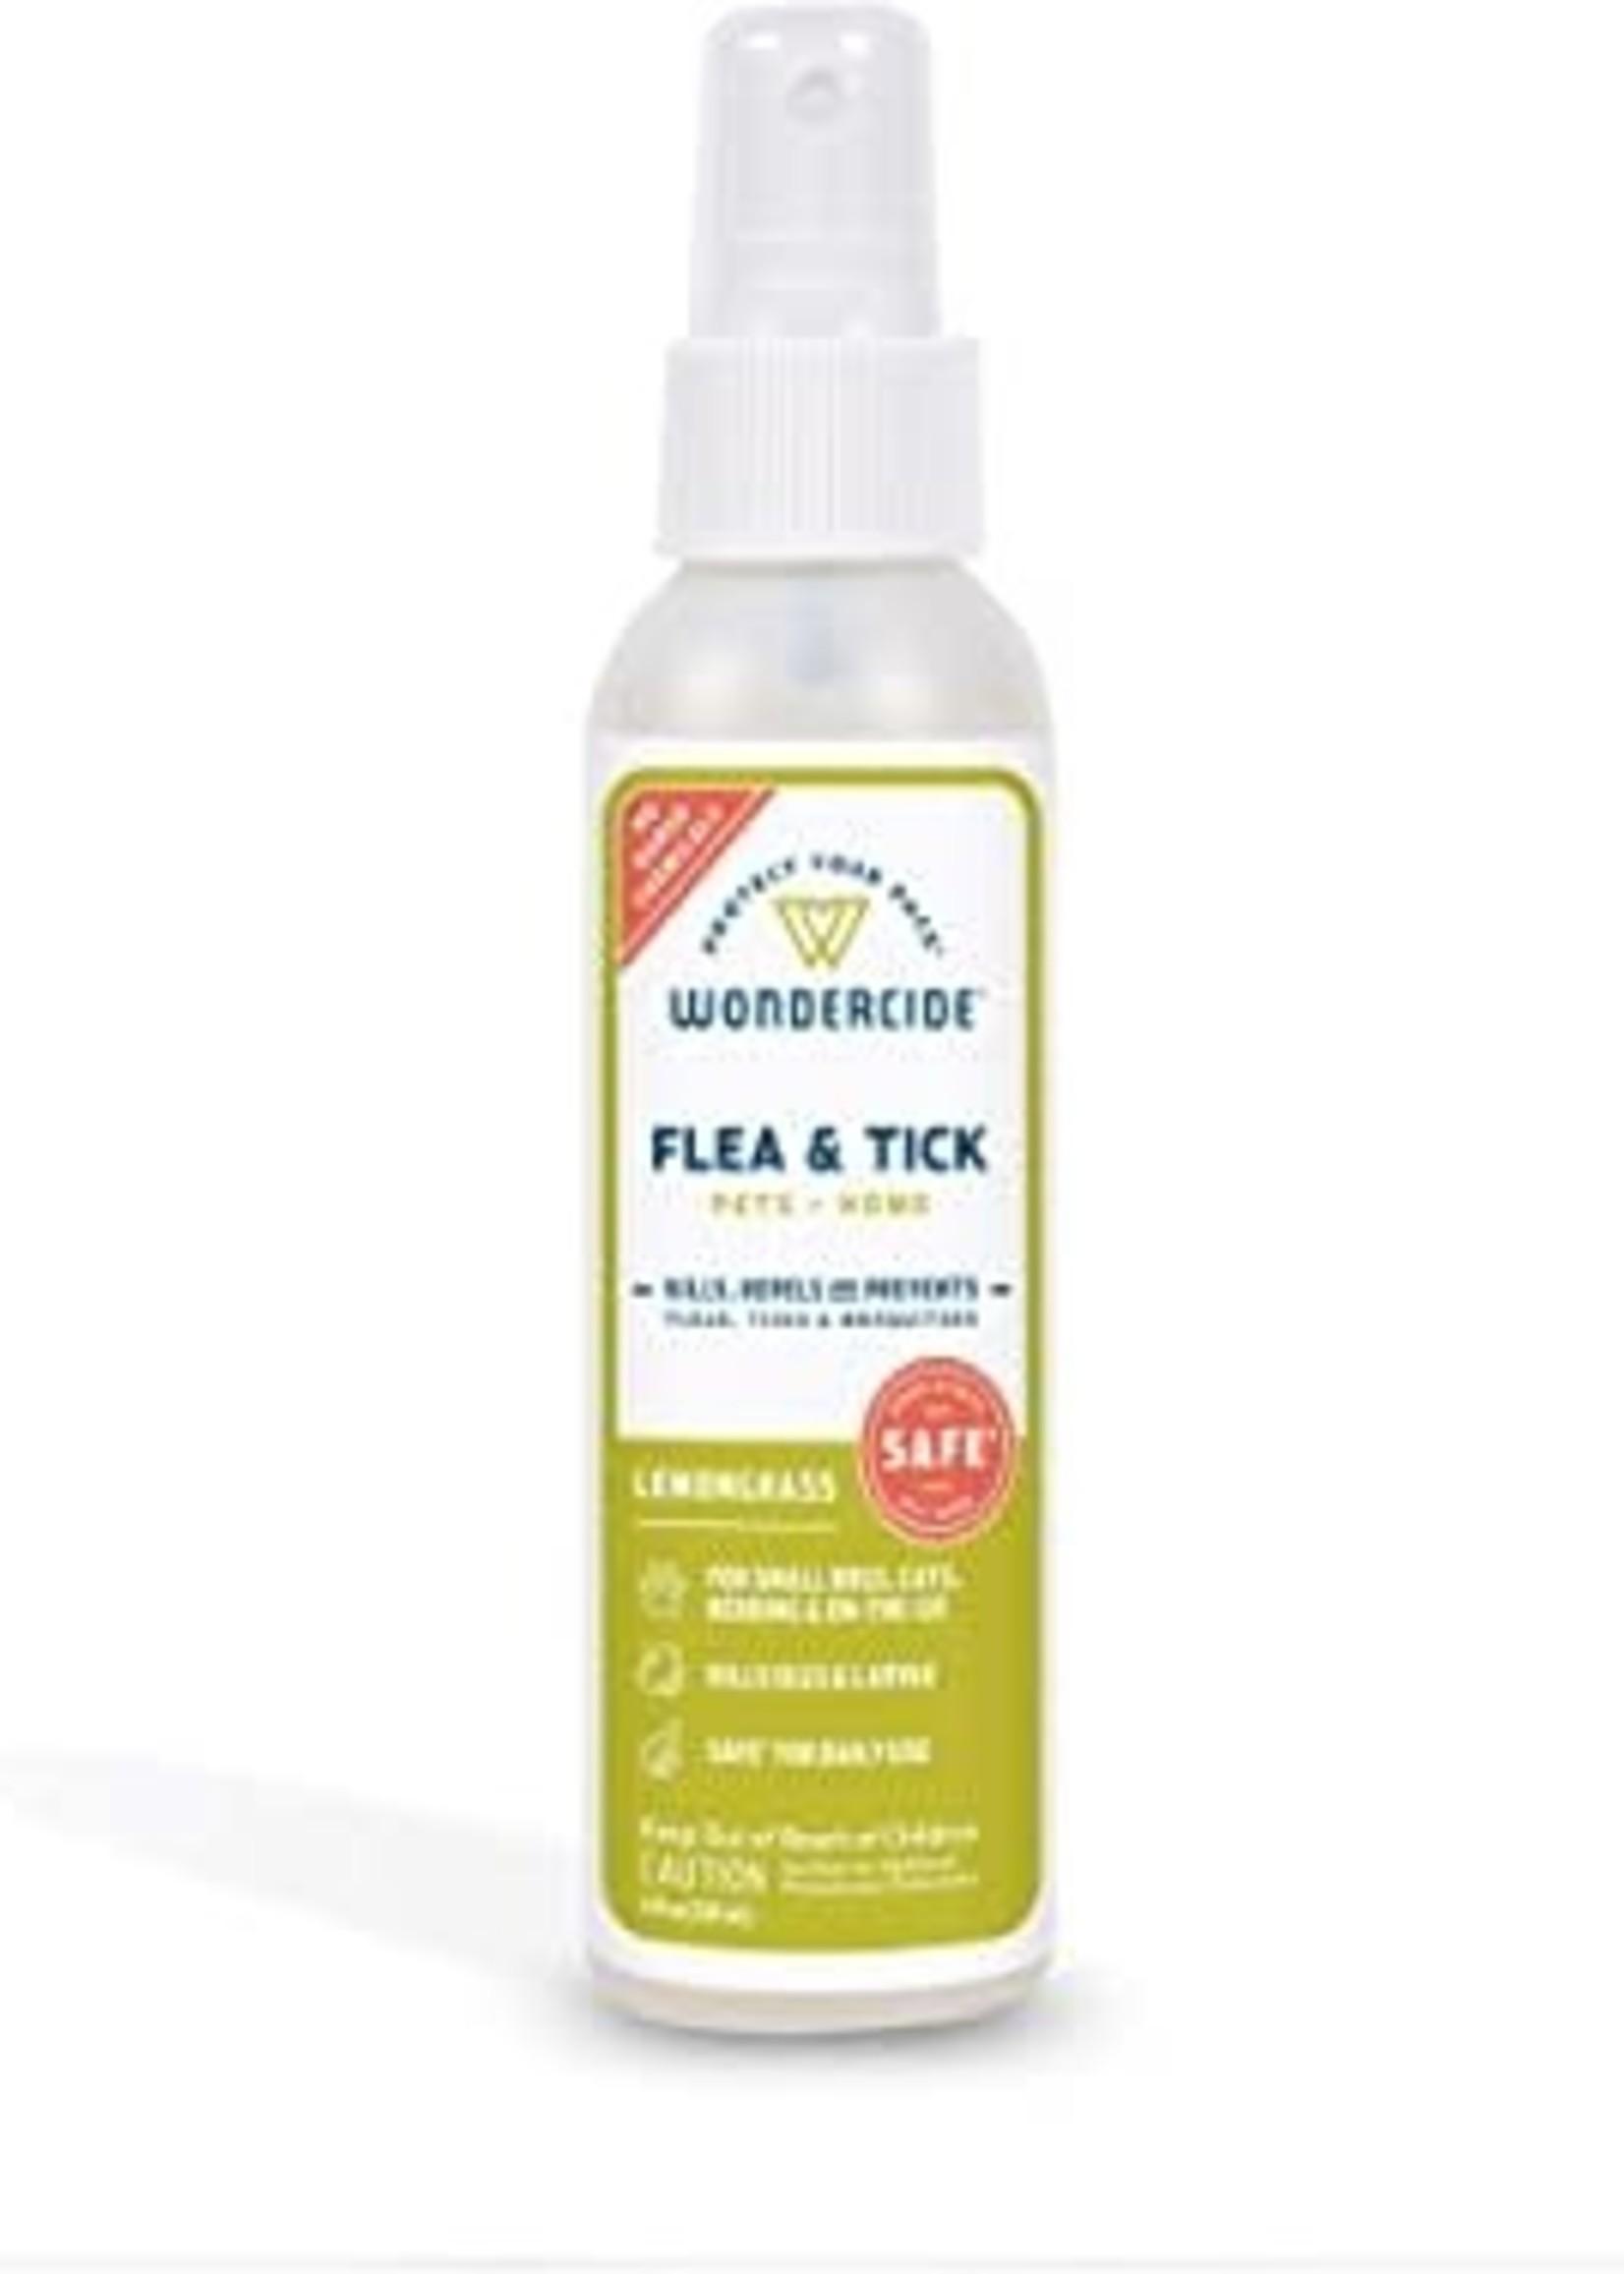 Wondercide Wondercide Flea & Tick Spray Lemon 4 oz